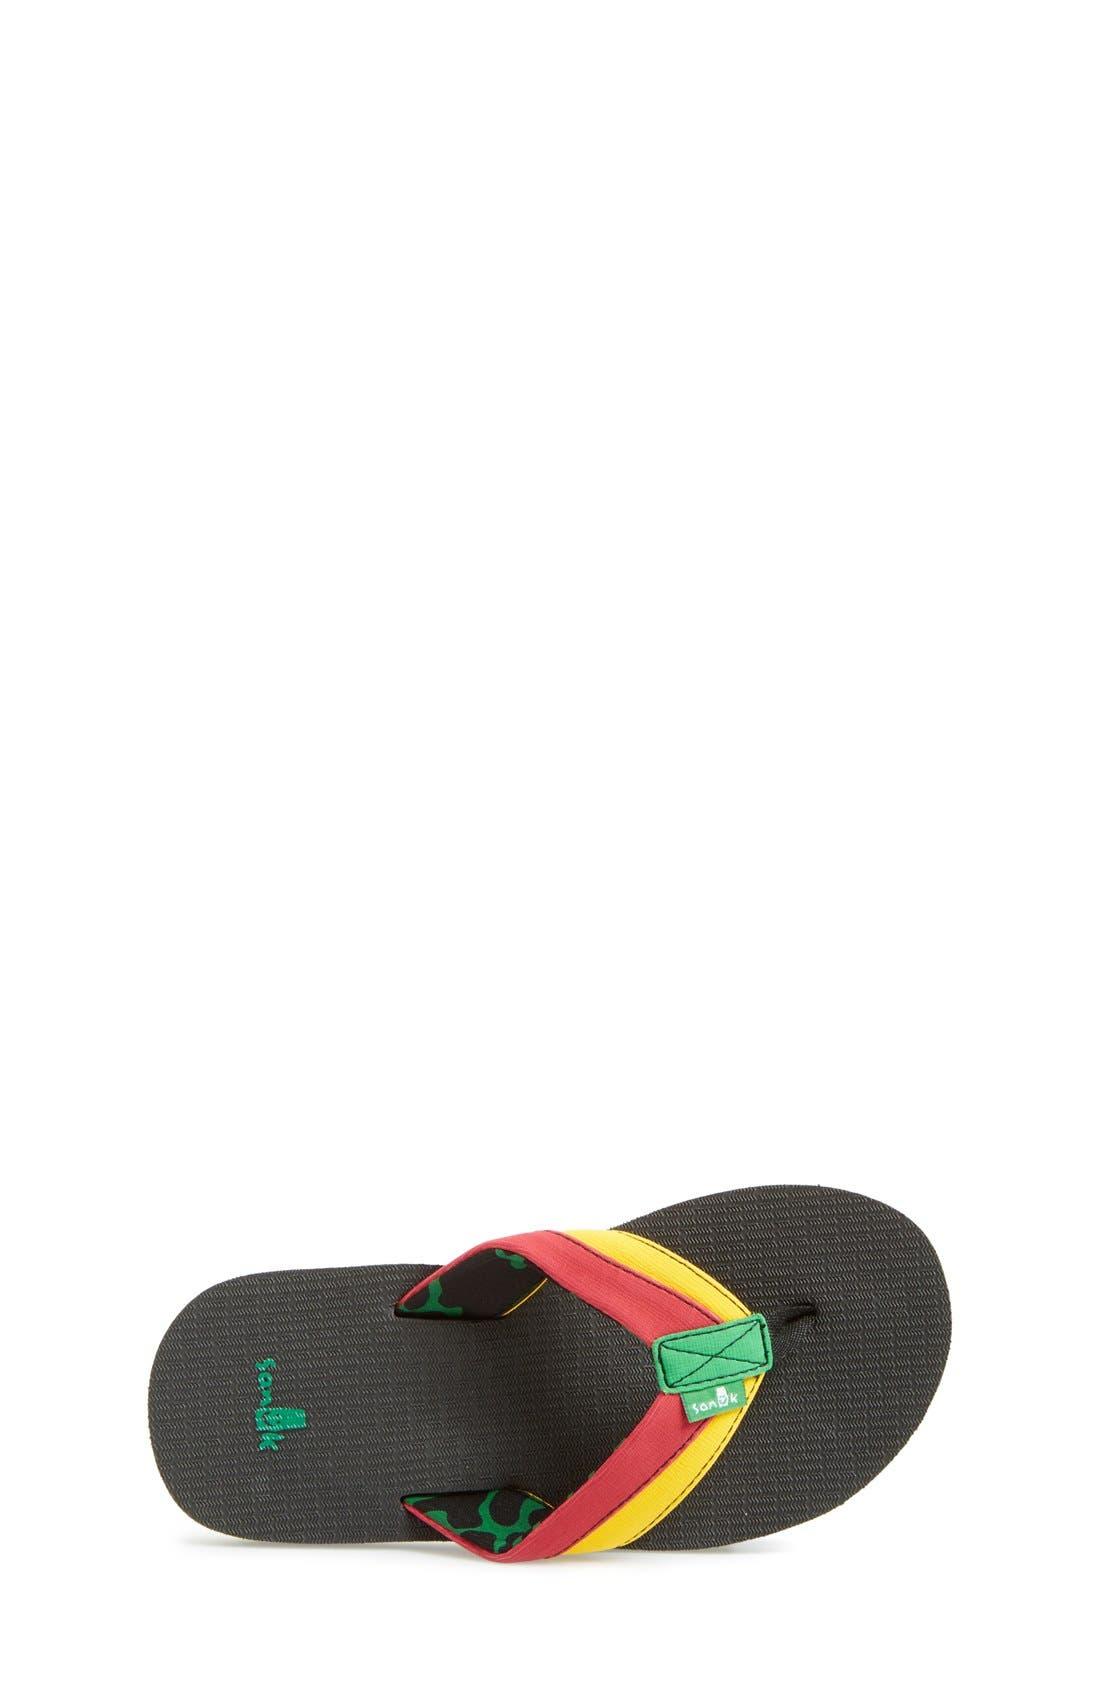 'Rootbeer Cozy' Lightweight Flip Flop Sandal,                             Alternate thumbnail 12, color,